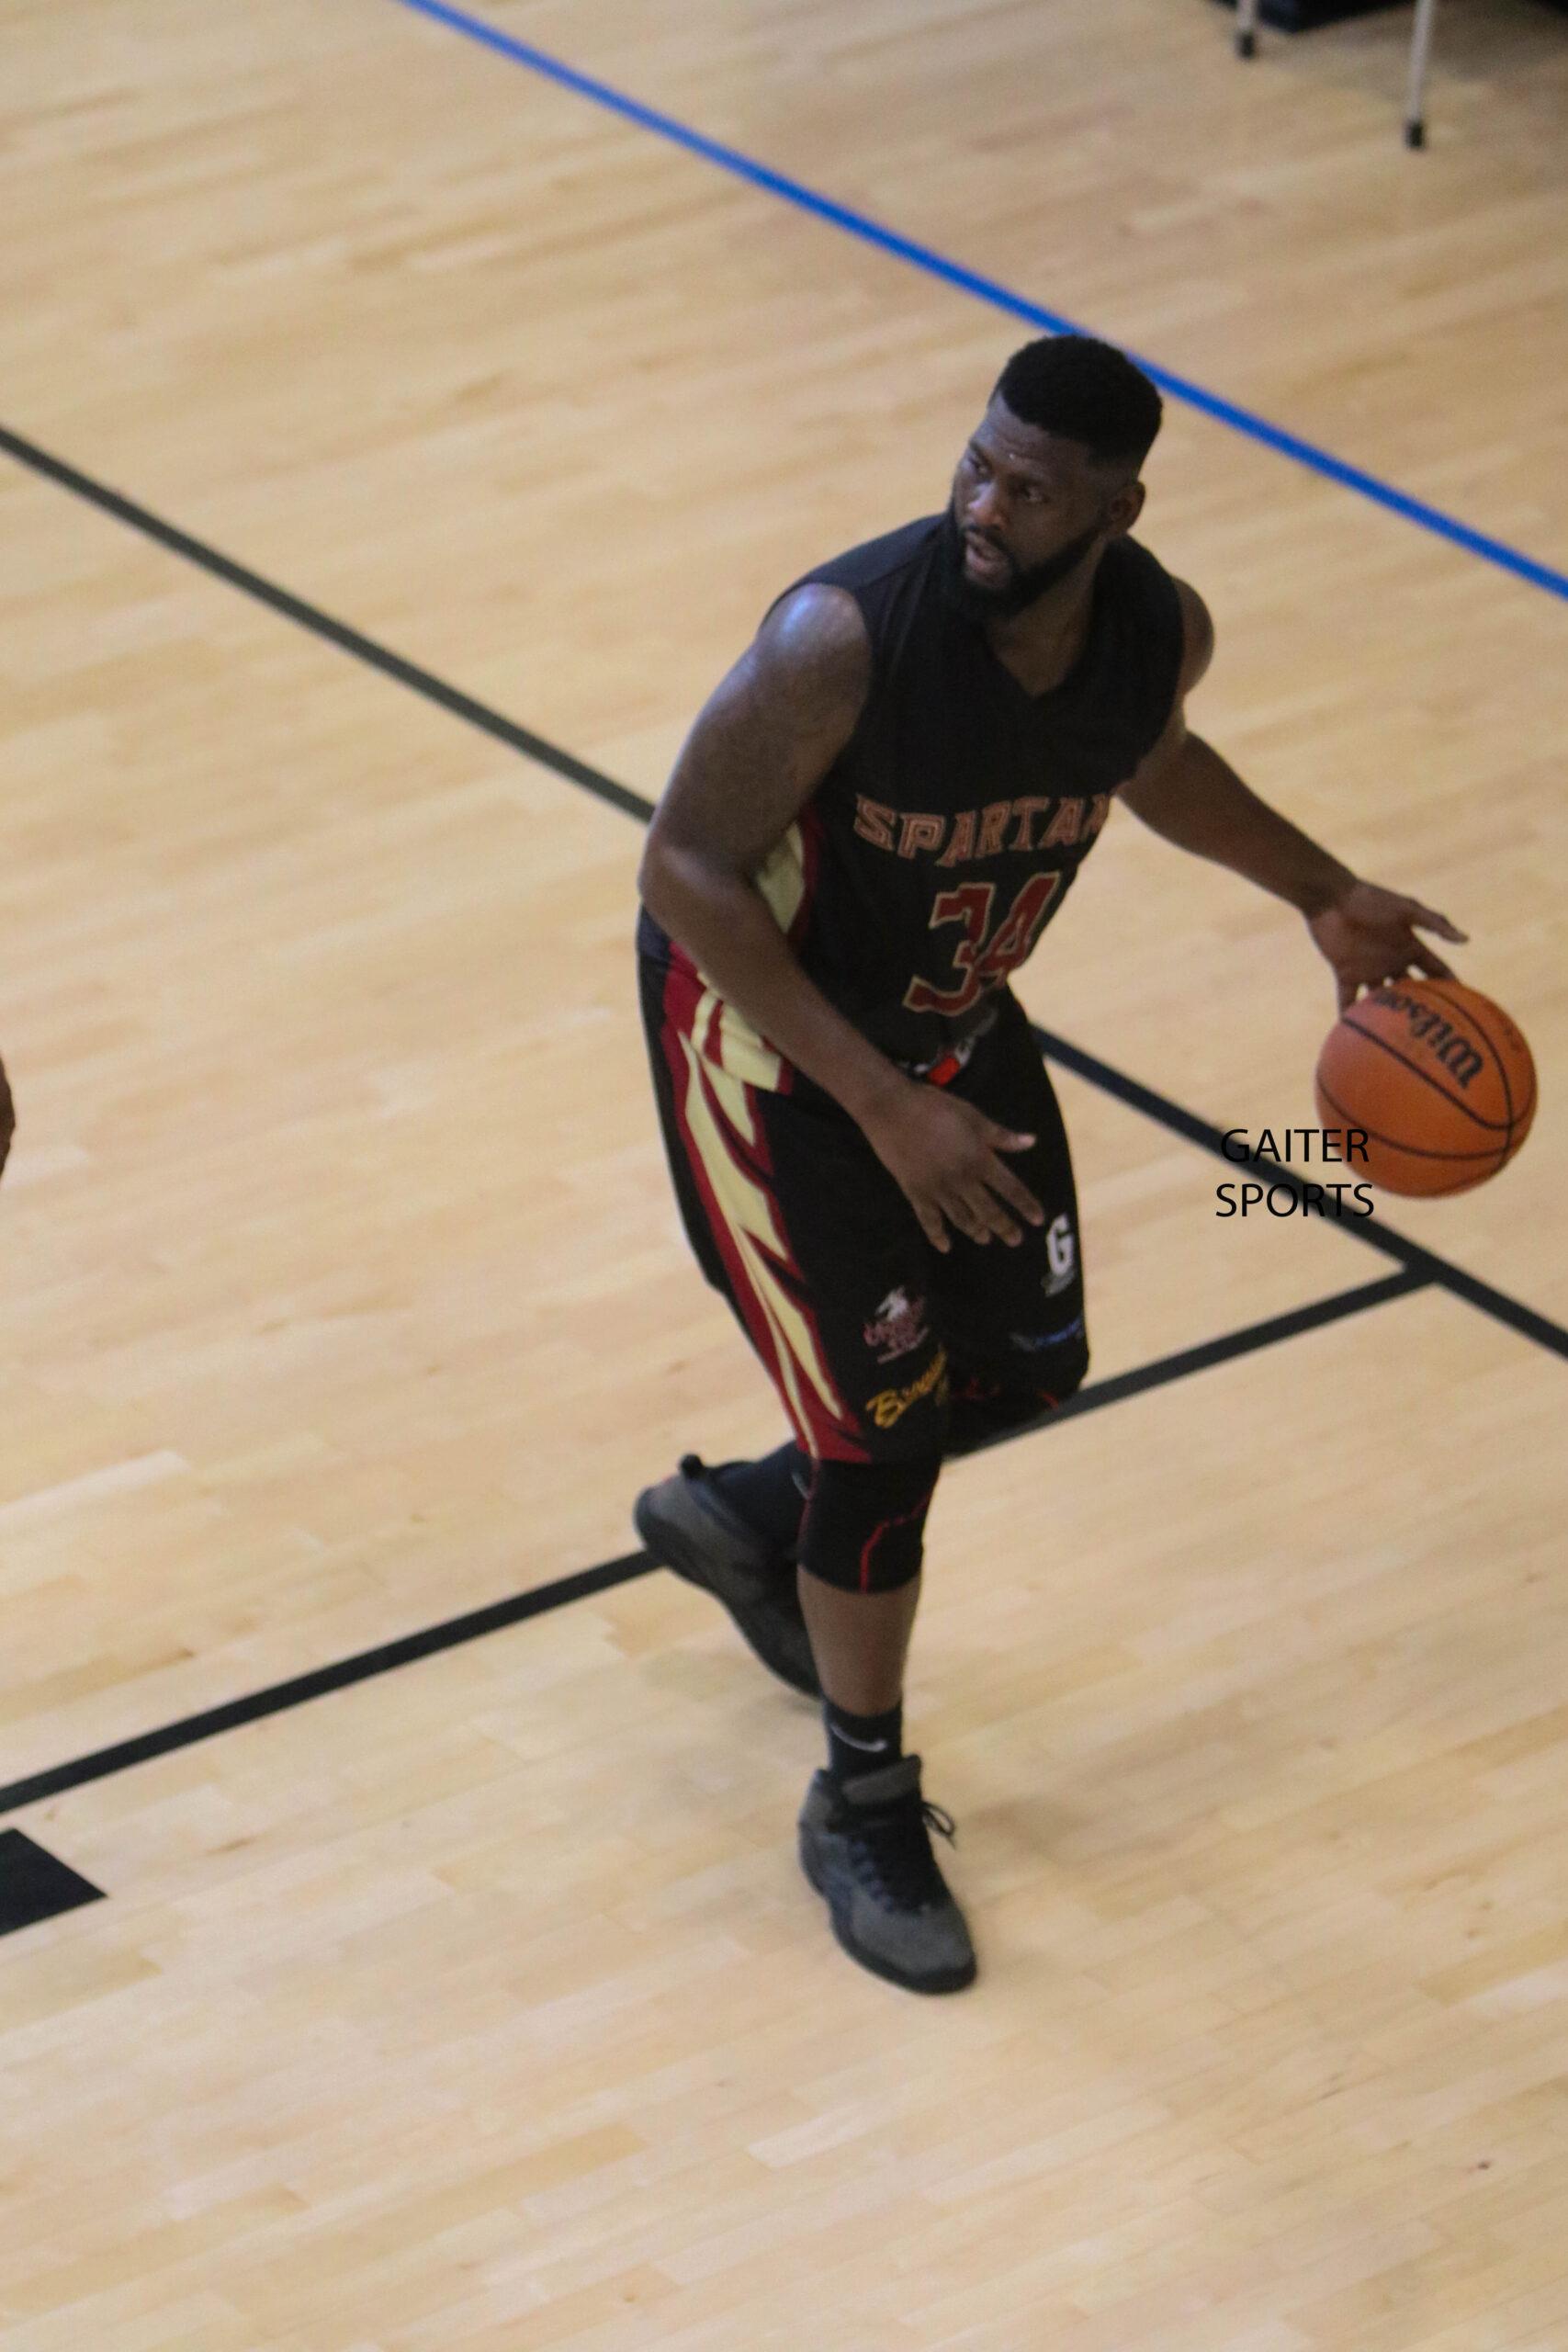 2019 Celebrity Basketball Game Georgia Spartans 29 Parysh Munroe